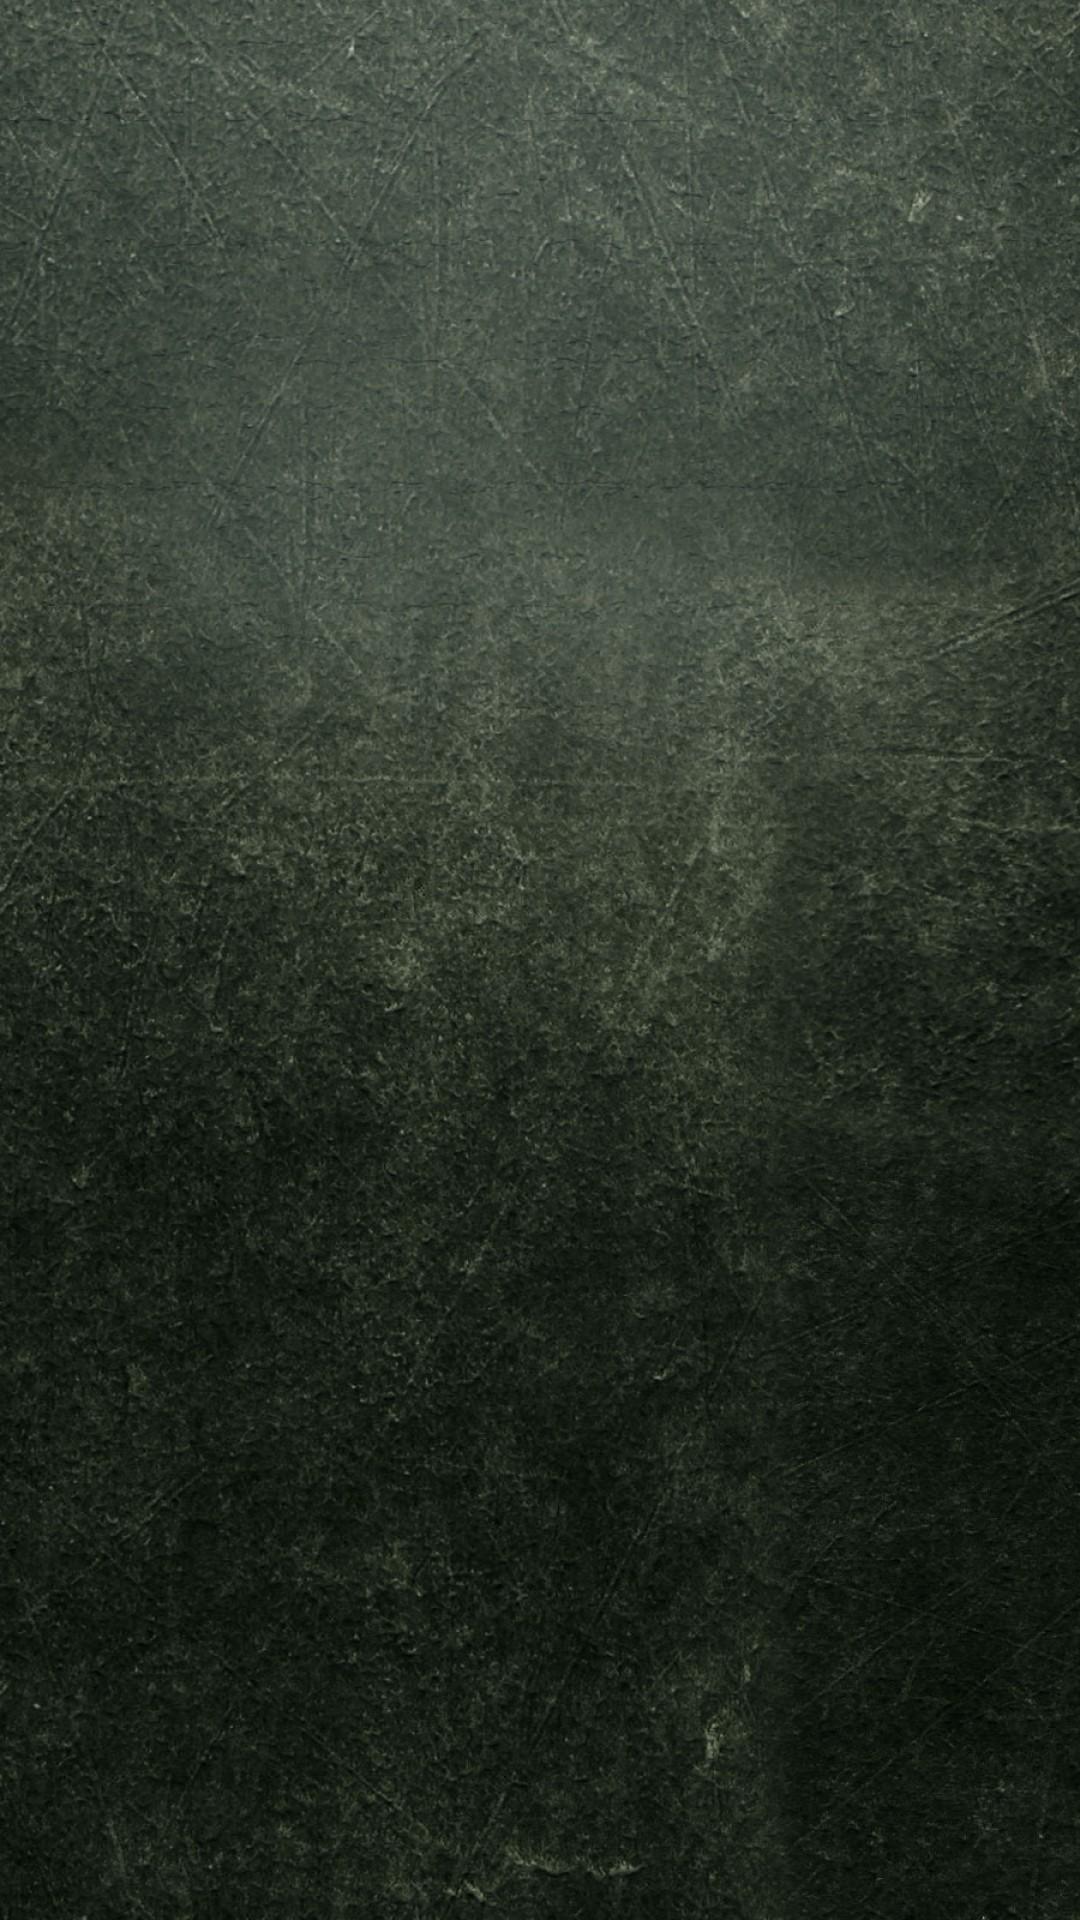 Dark Minimalist Wallpaper (80+ images)